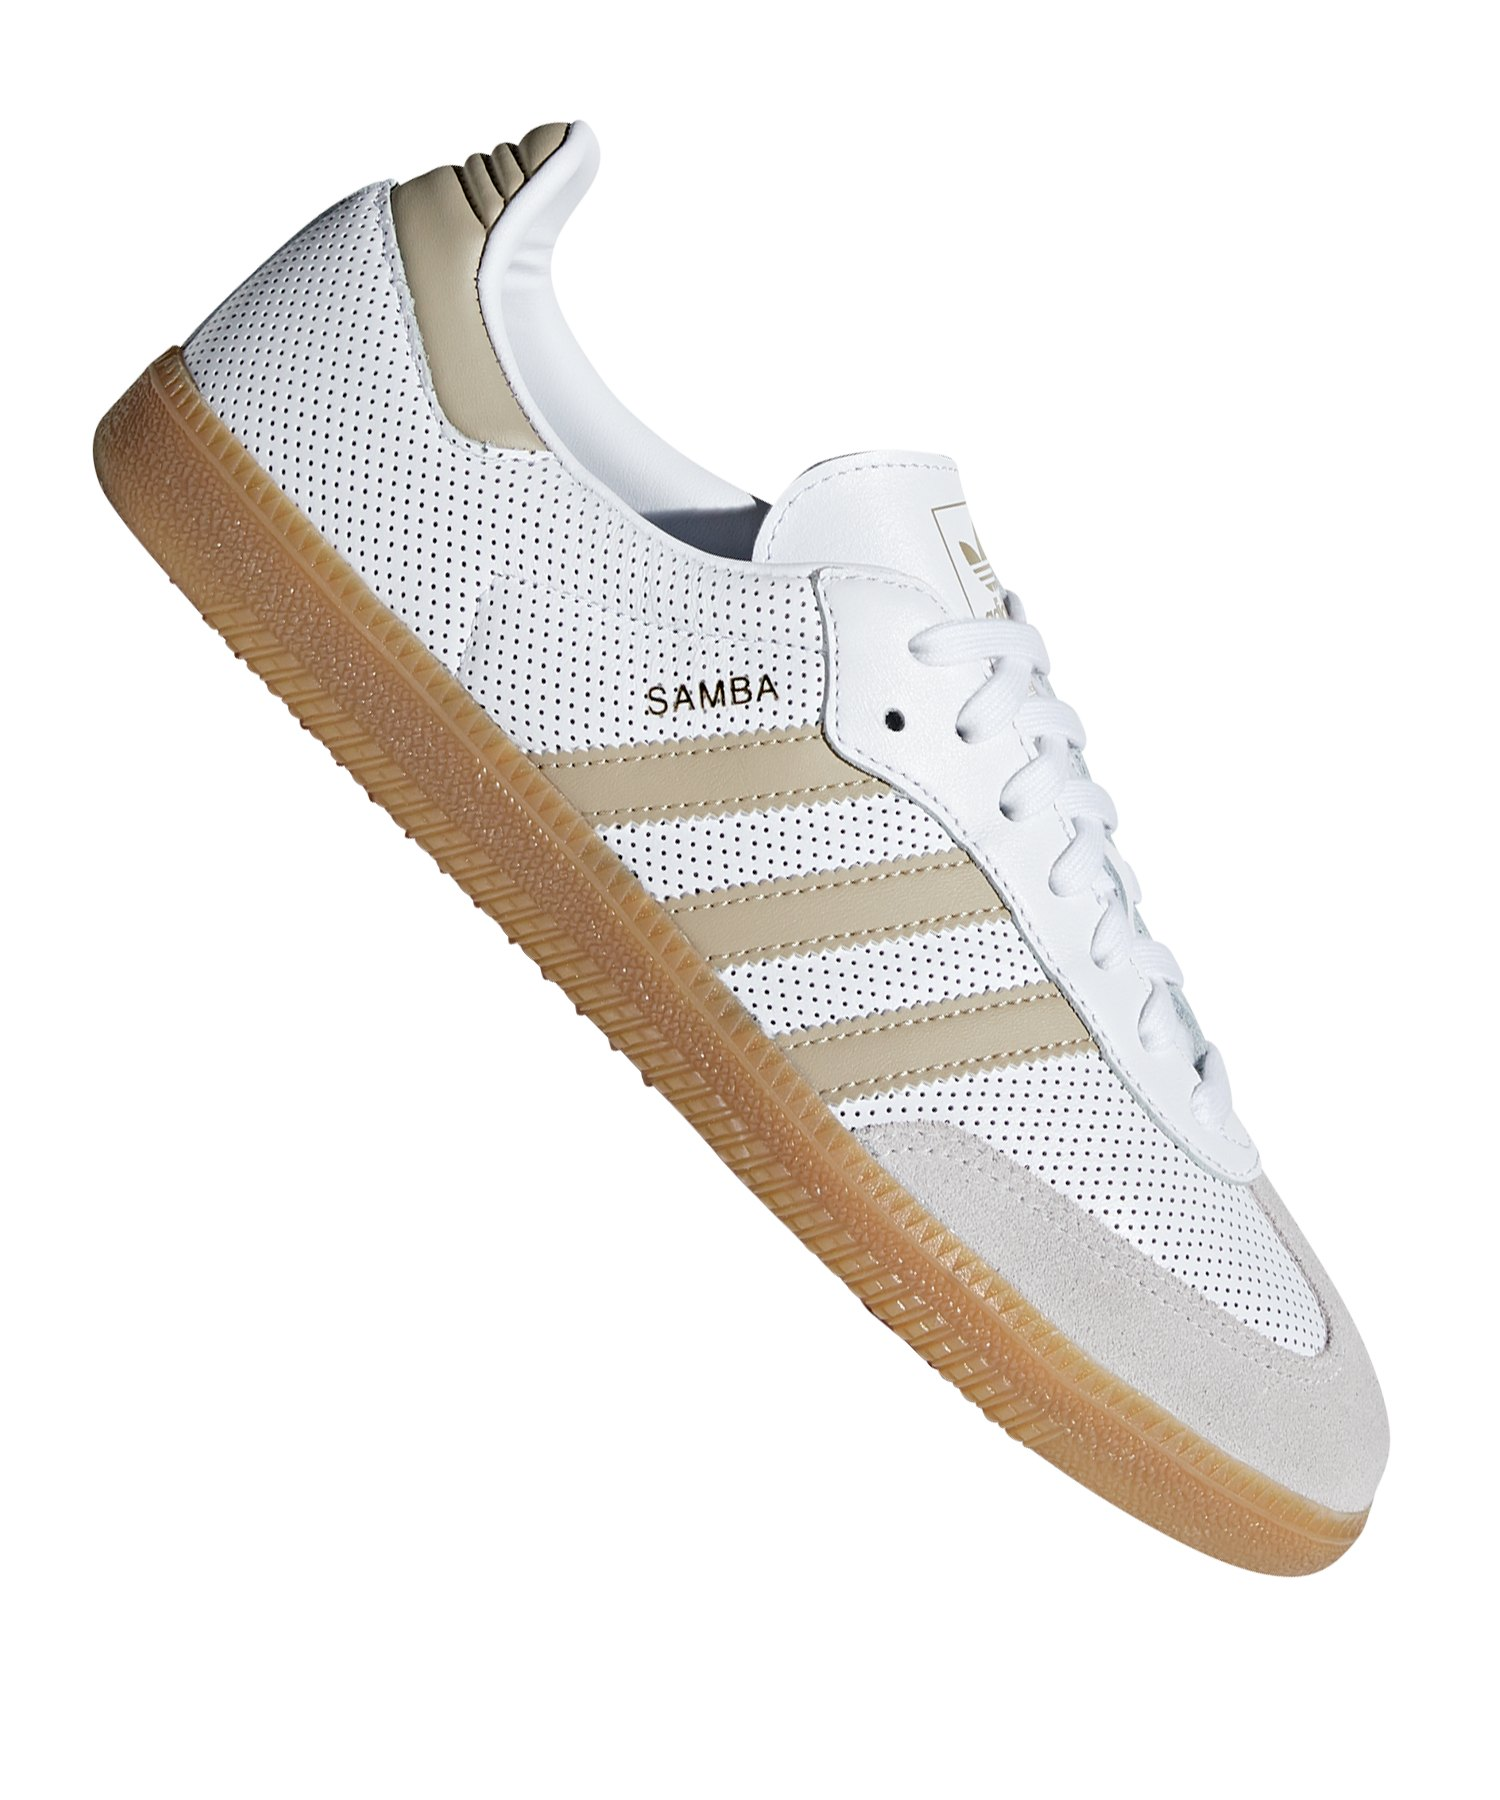 adidas Samba braun Gr.44: : Schuhe & Handtaschen